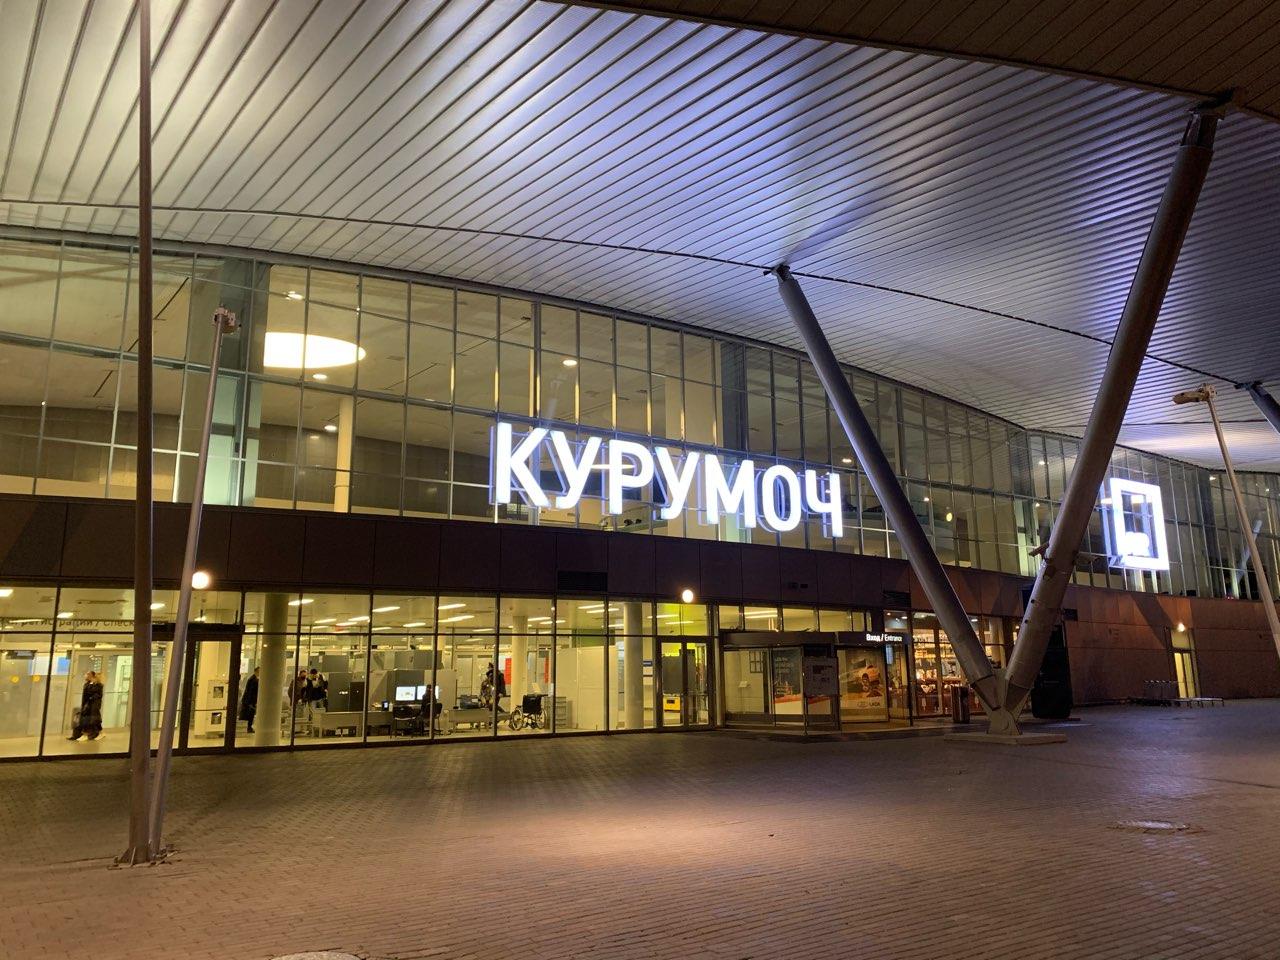 В Самаре отменили торги по аренде земли у аэродрома Курумоч